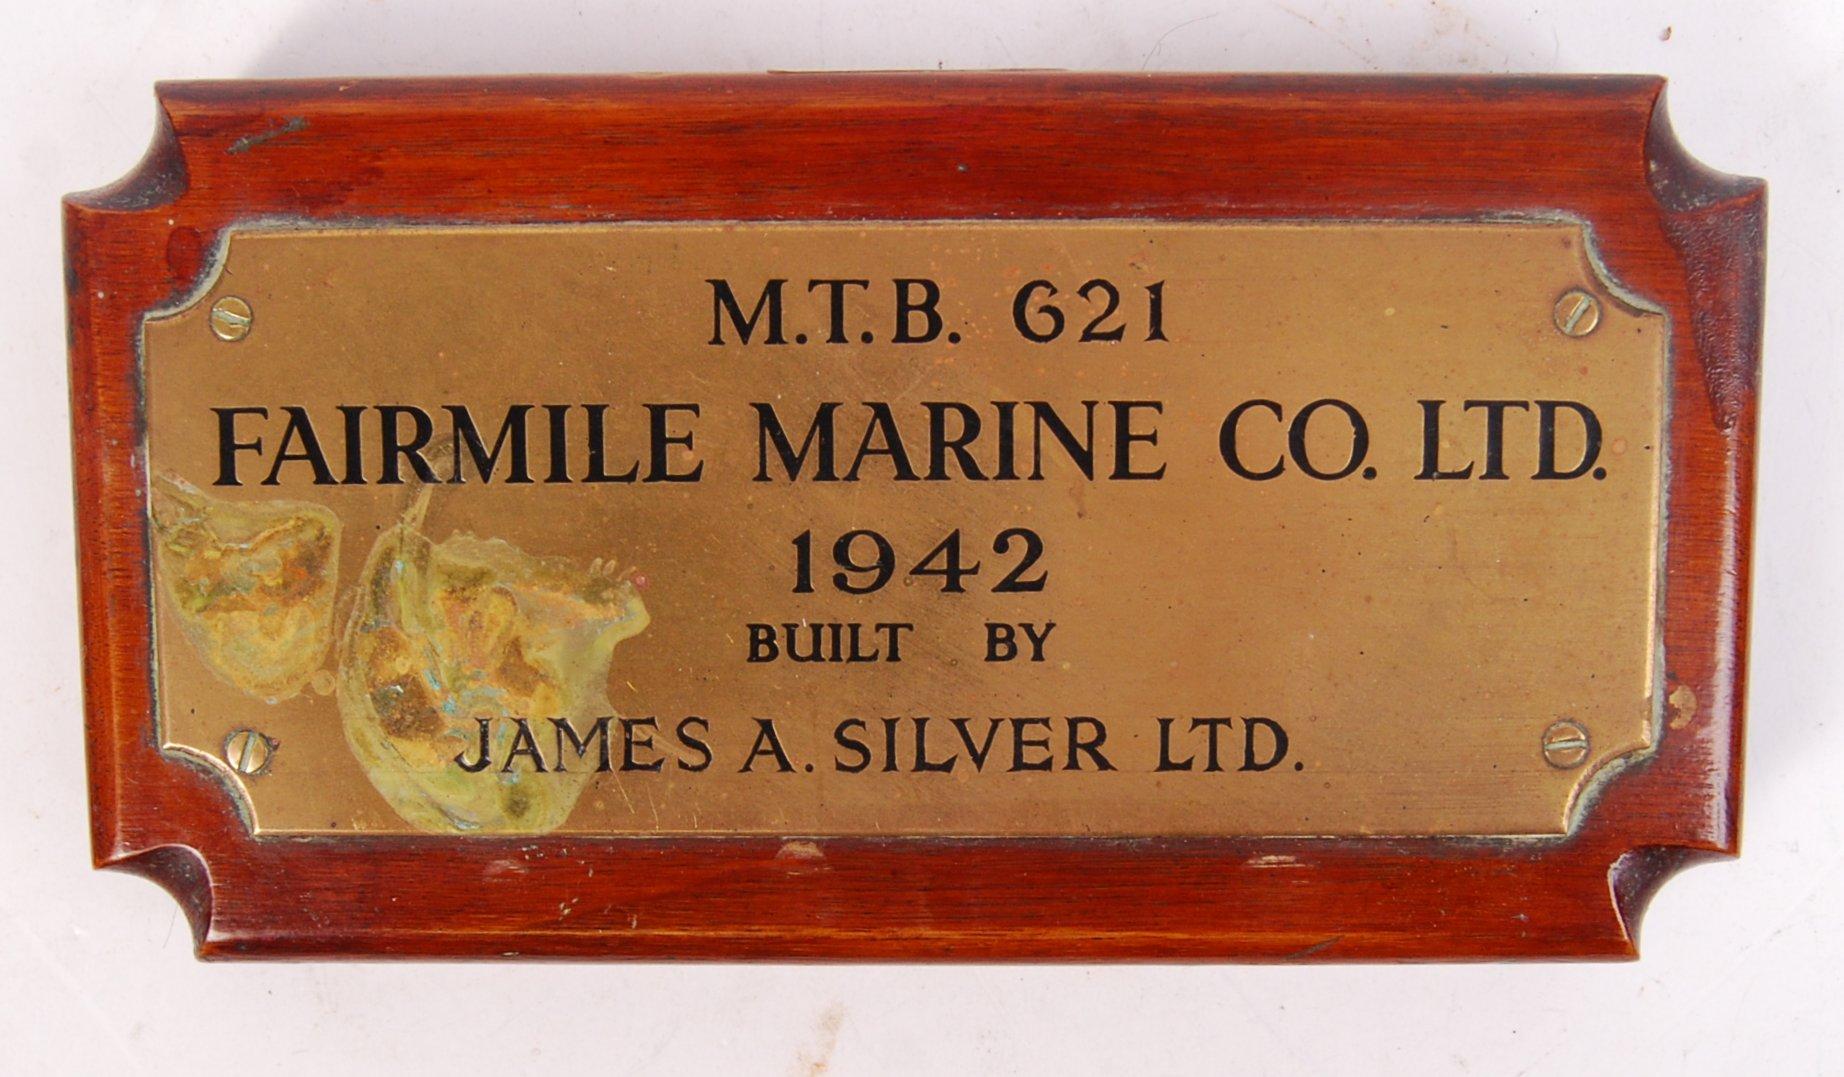 Lot 45 - RARE FAIRMILE MARINE WWII MOTOR TORPEDO BOAT MAKER'S PLAQUE